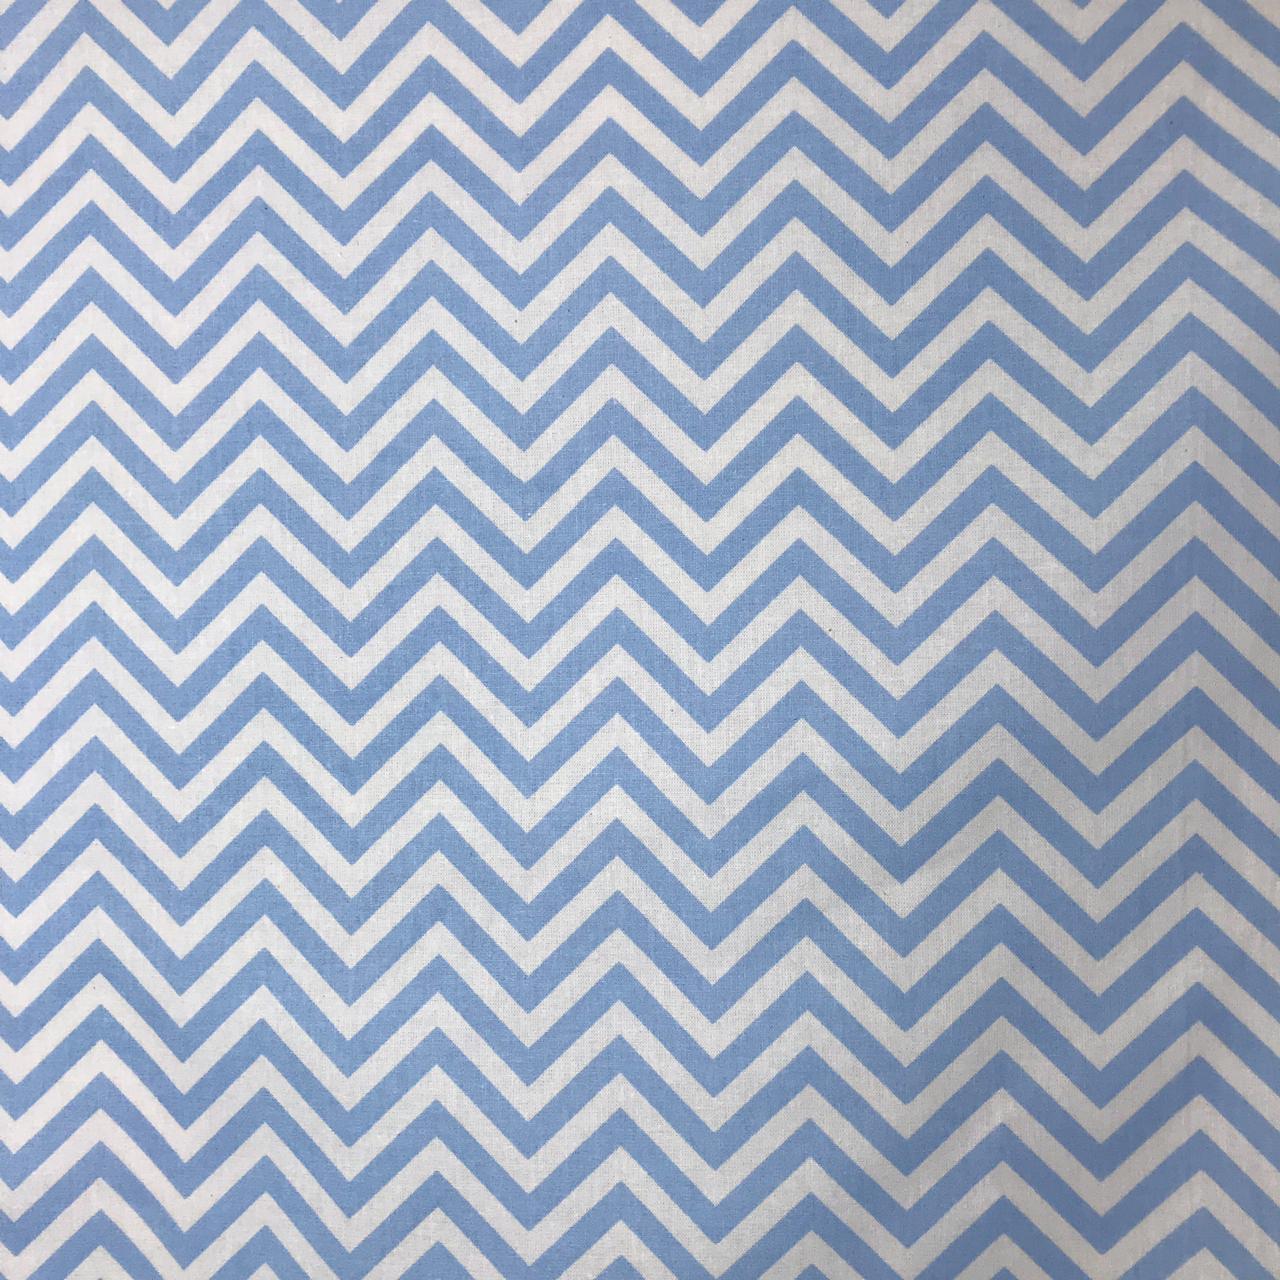 Tecido Tricoline  Chevron Azul Bebê - 1,50m de Largura